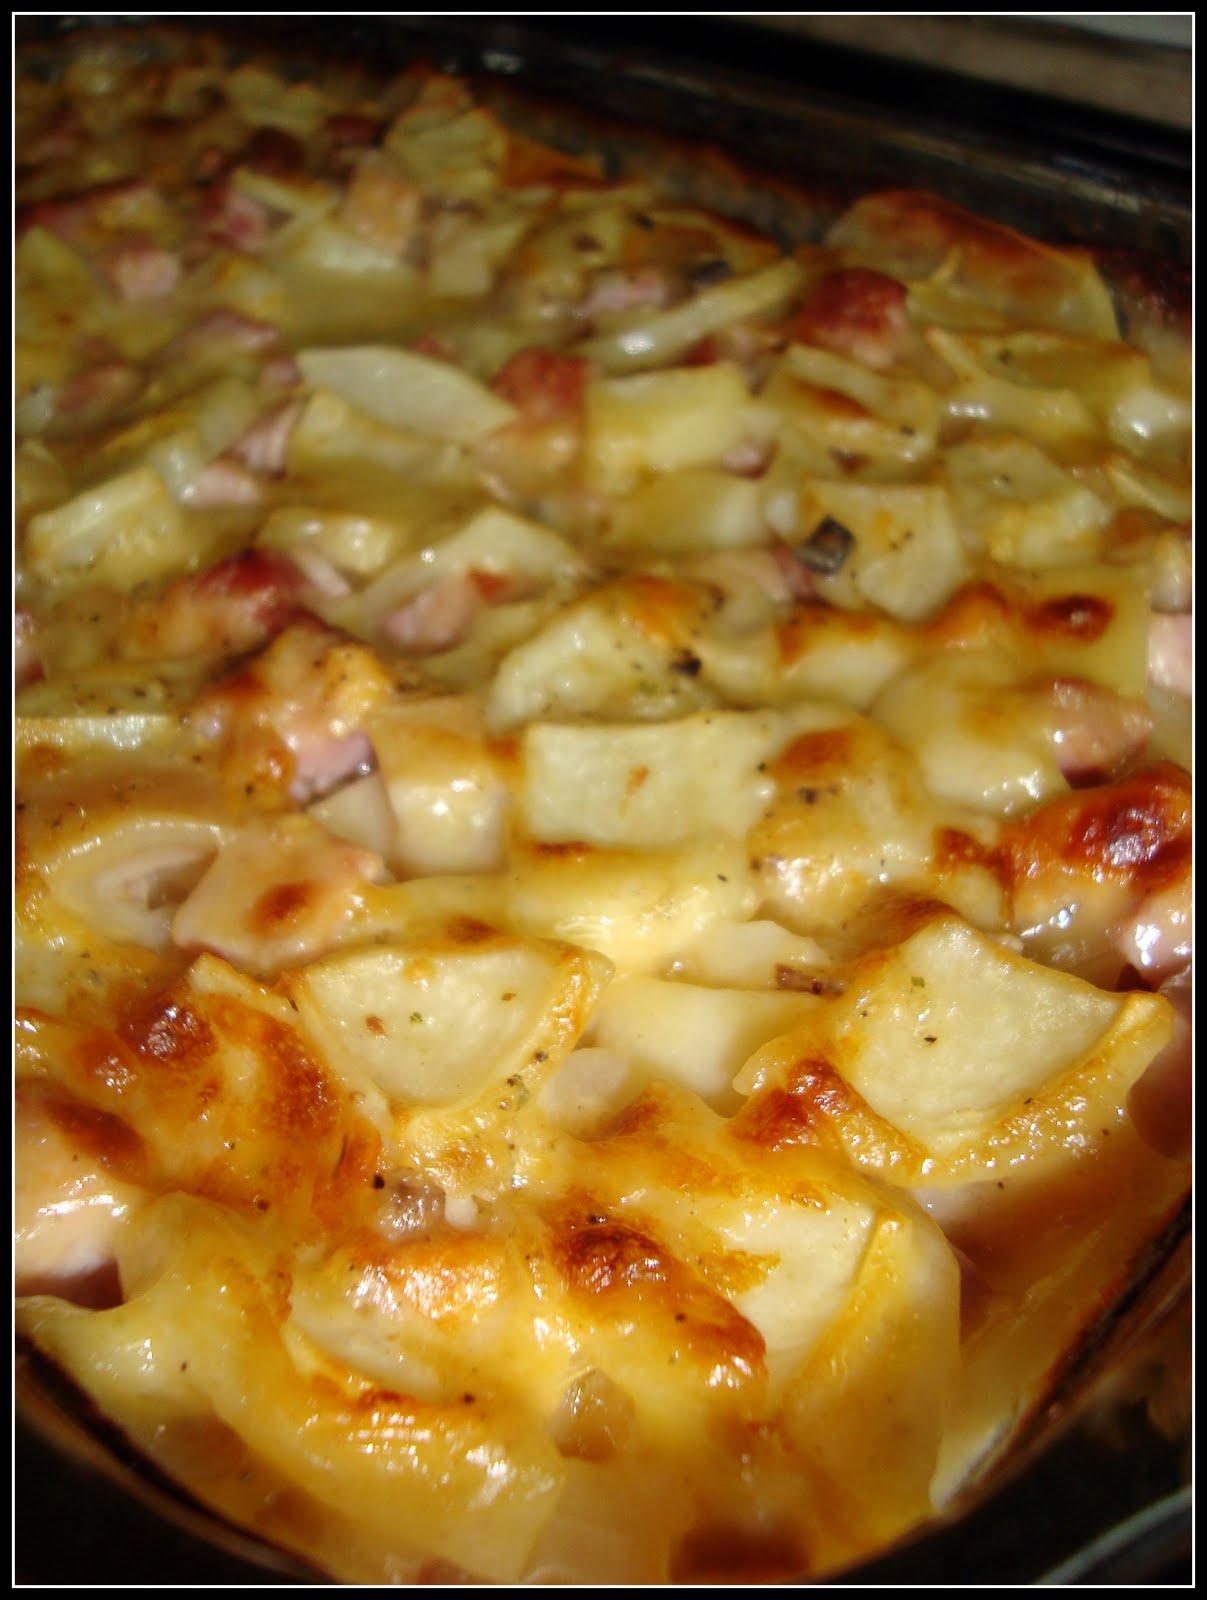 ... potatoes classic scalloped potatoes scalloped potatoes and ham jpg w